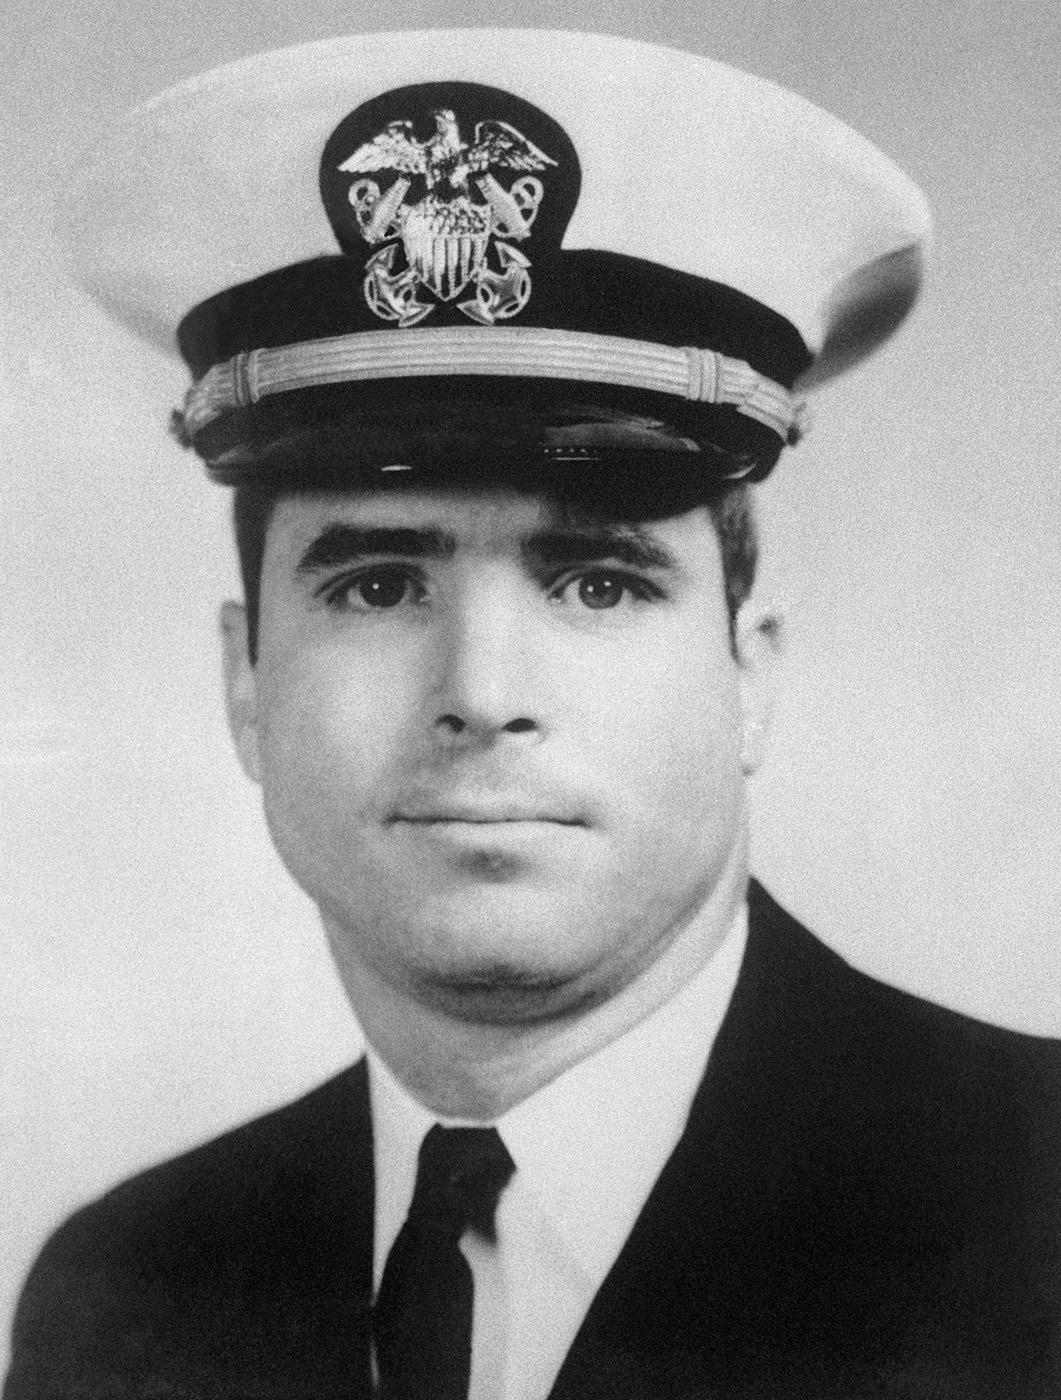 U.S. Navy flier Lt. Commander John McCain